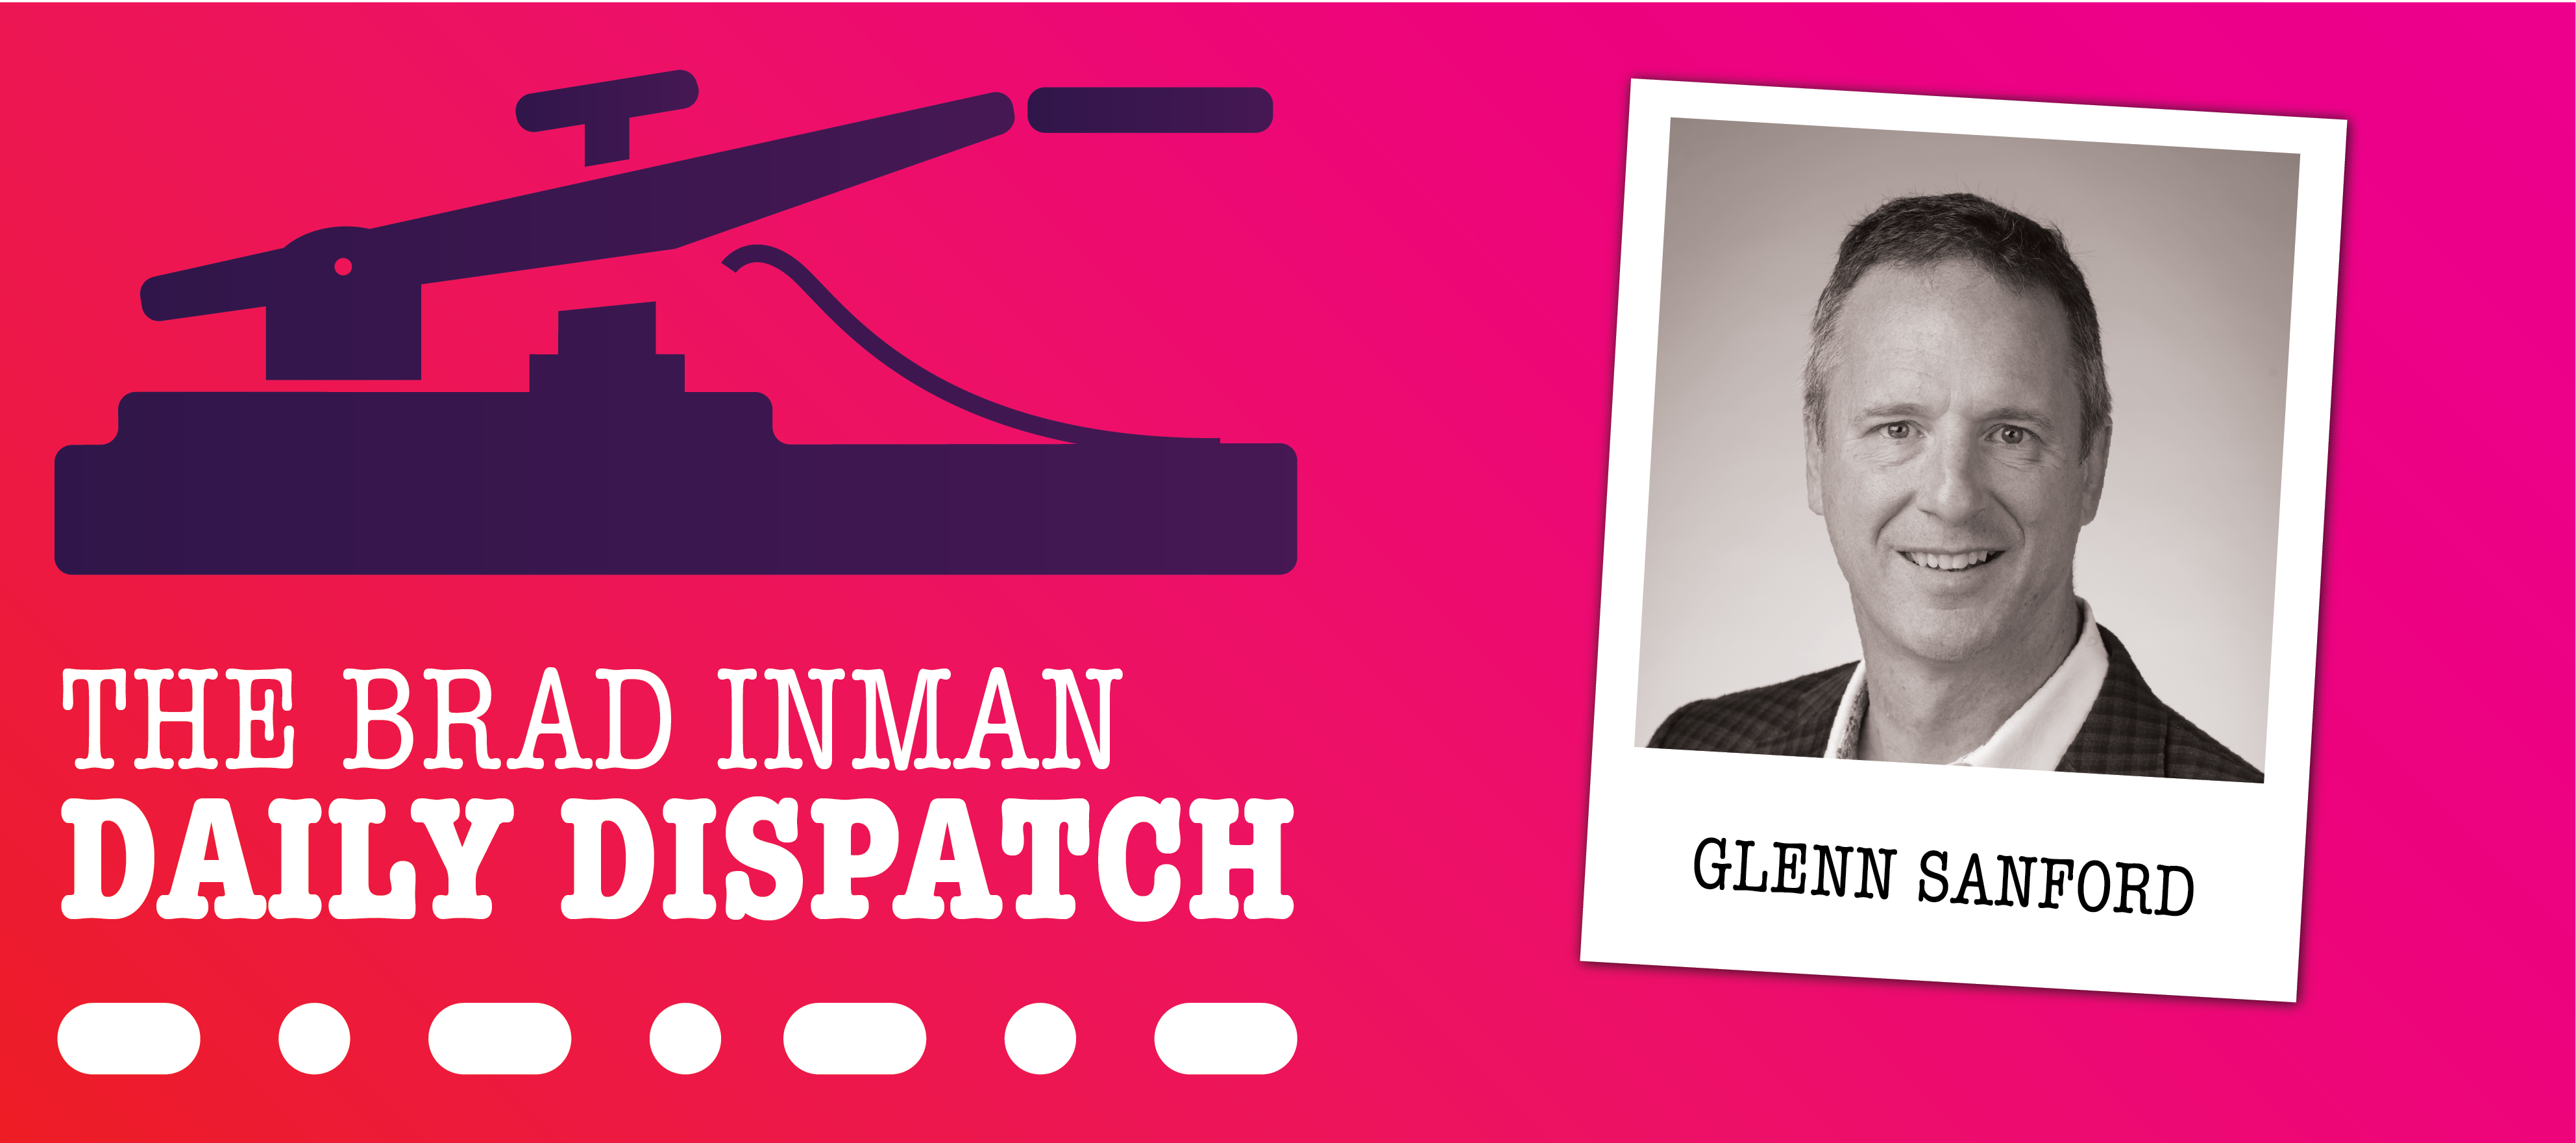 Daily Dispatch: Brad Inman with Glenn Sanford